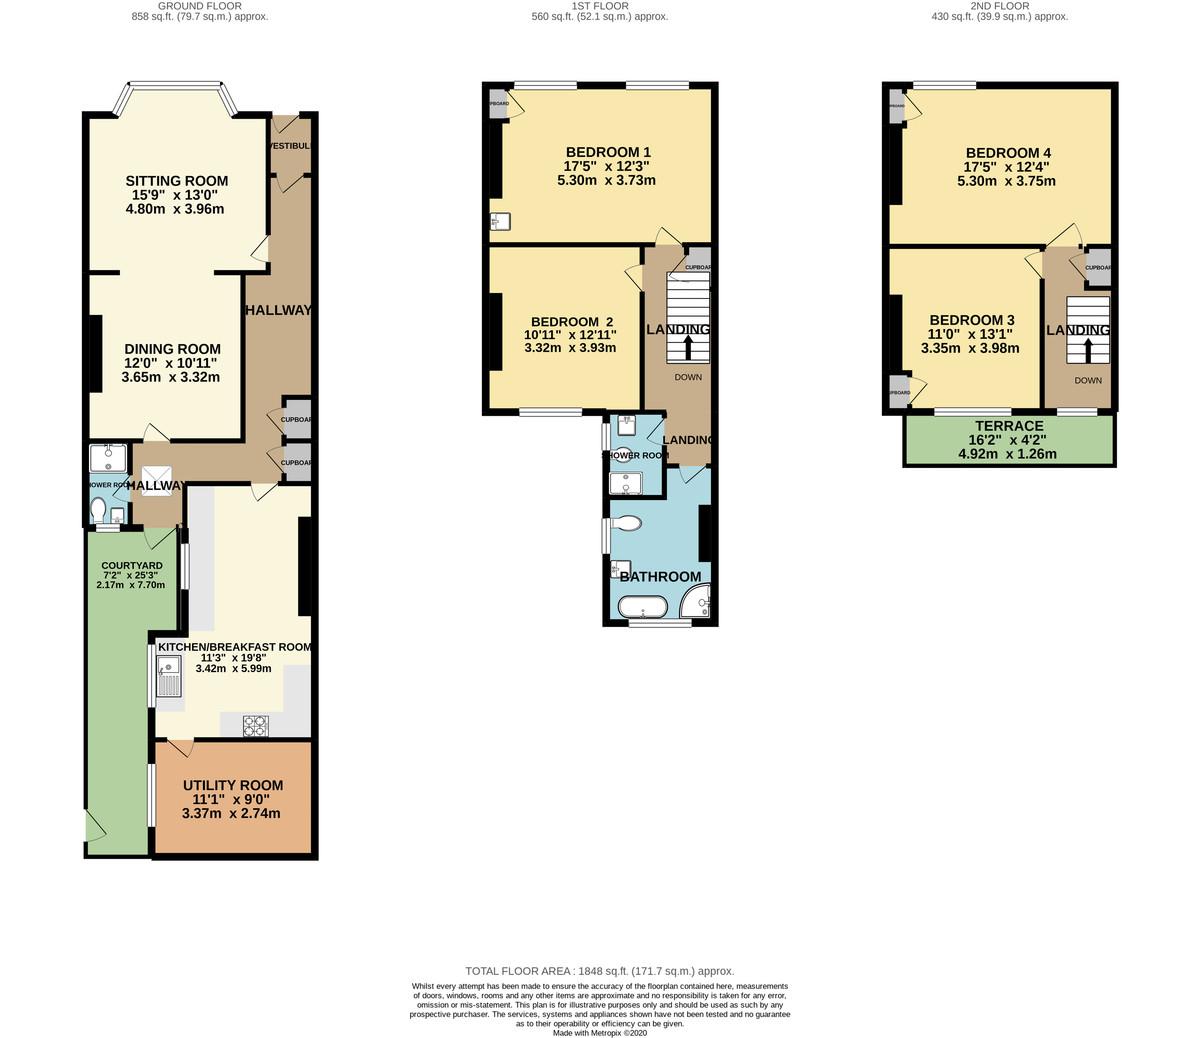 St. James Place East, The Hoe, Plymouth, Devon, PL1 3AS floorplan